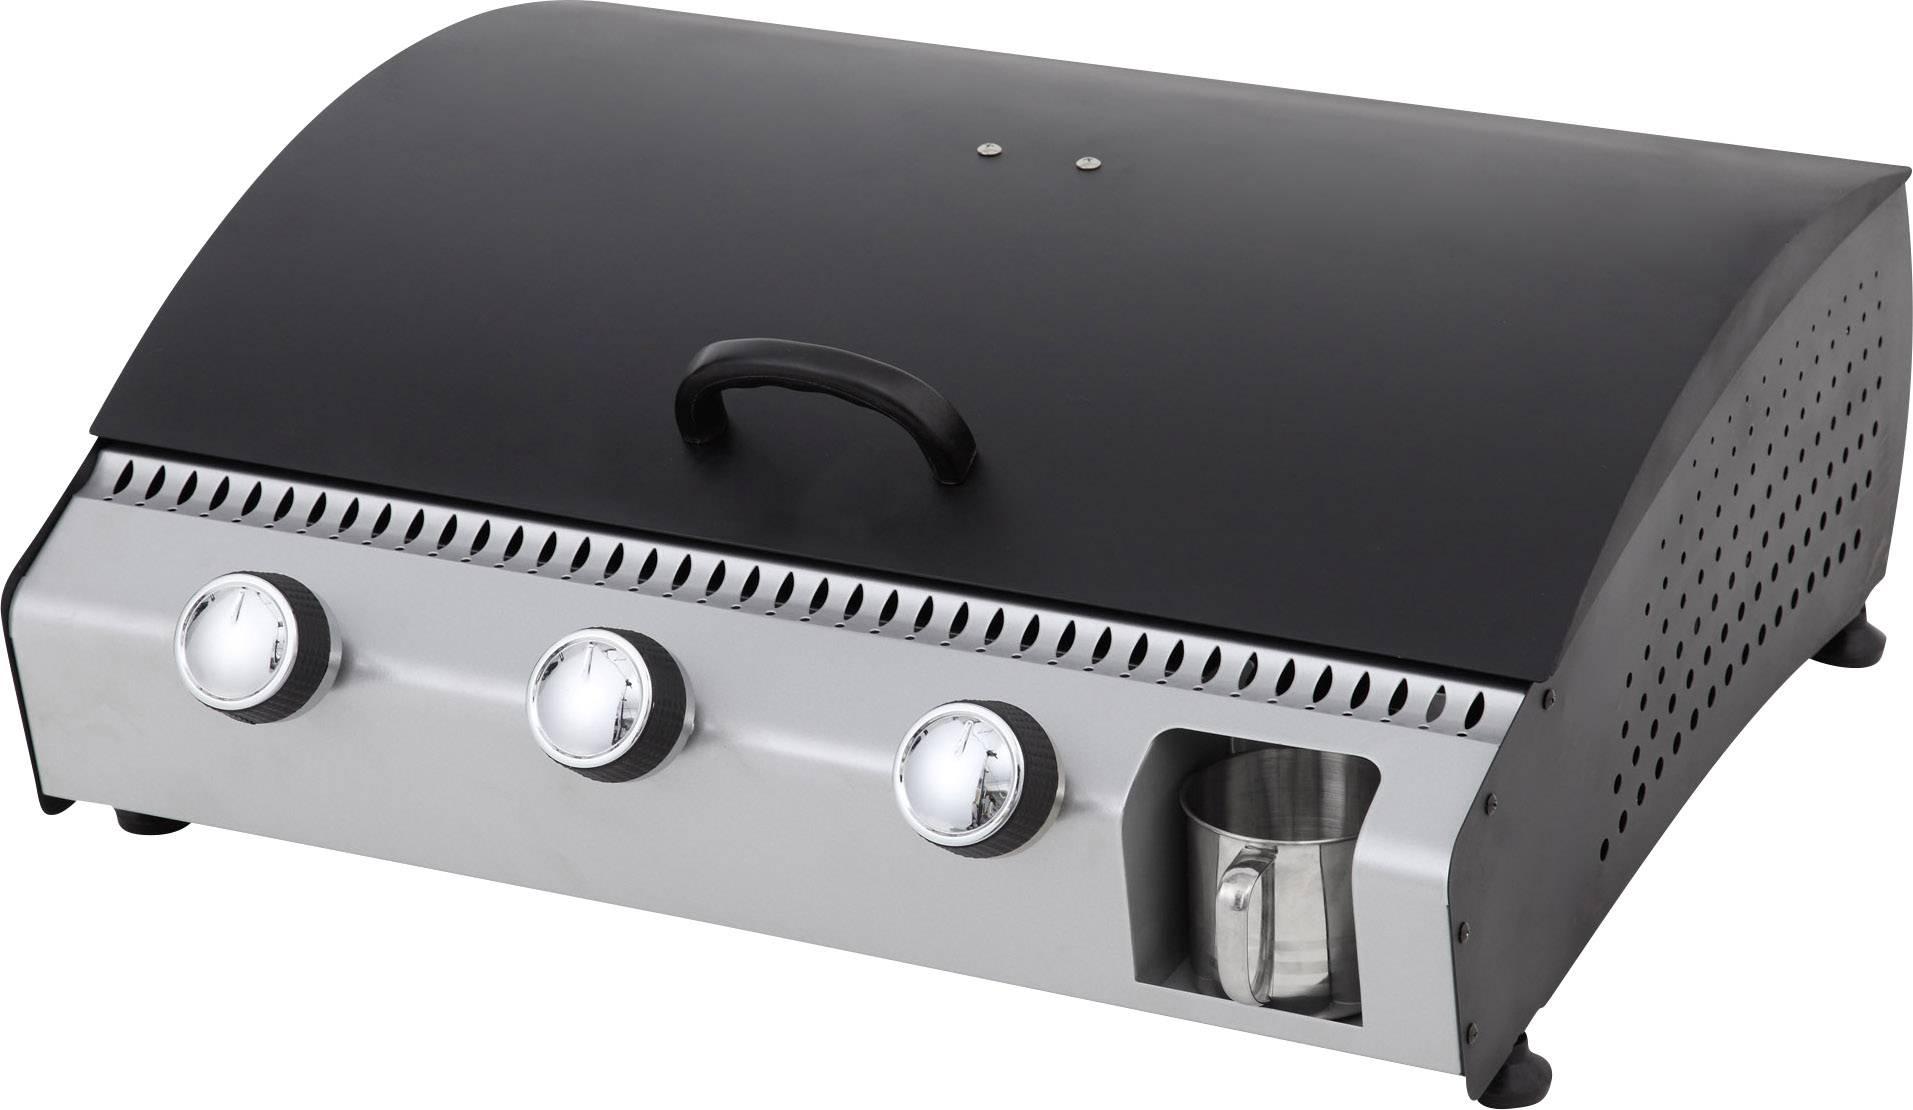 Plancha Für Gasgrill : Campingaz plancha lx gas grill